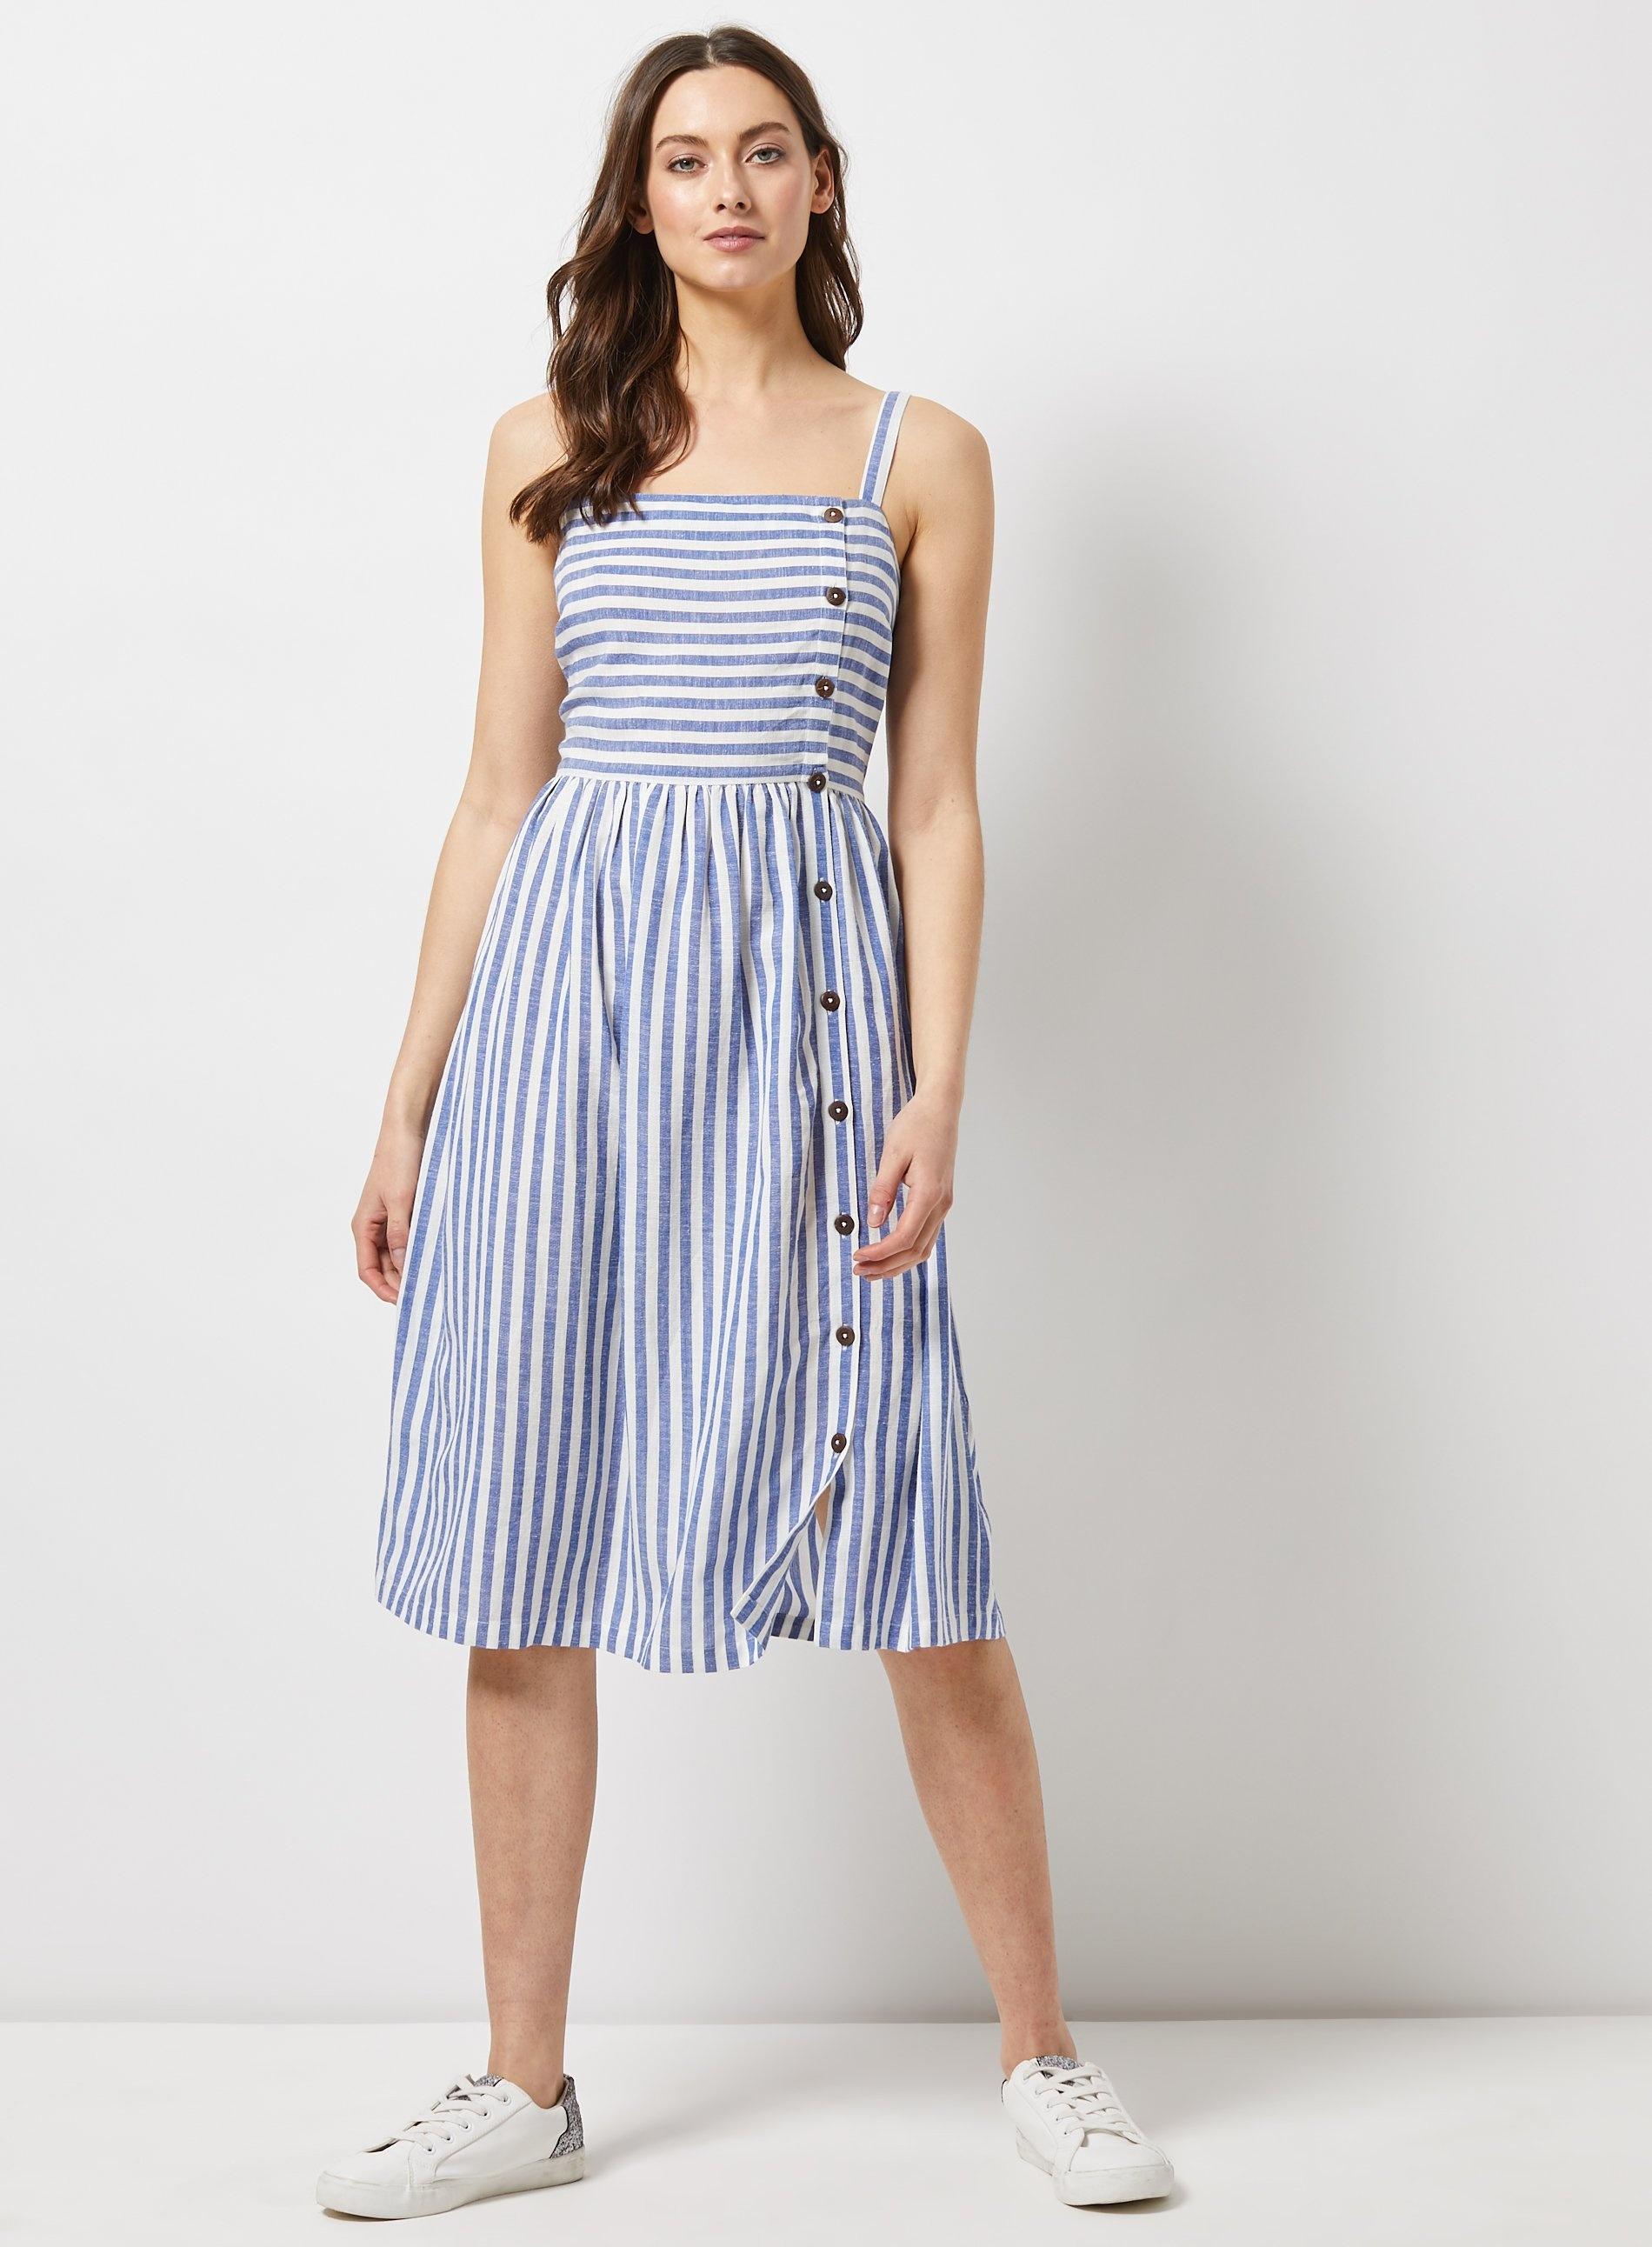 910d282fe6 Lyst - Dorothy Perkins Blue Linen Blend Striped Blend Camisole Dress ...